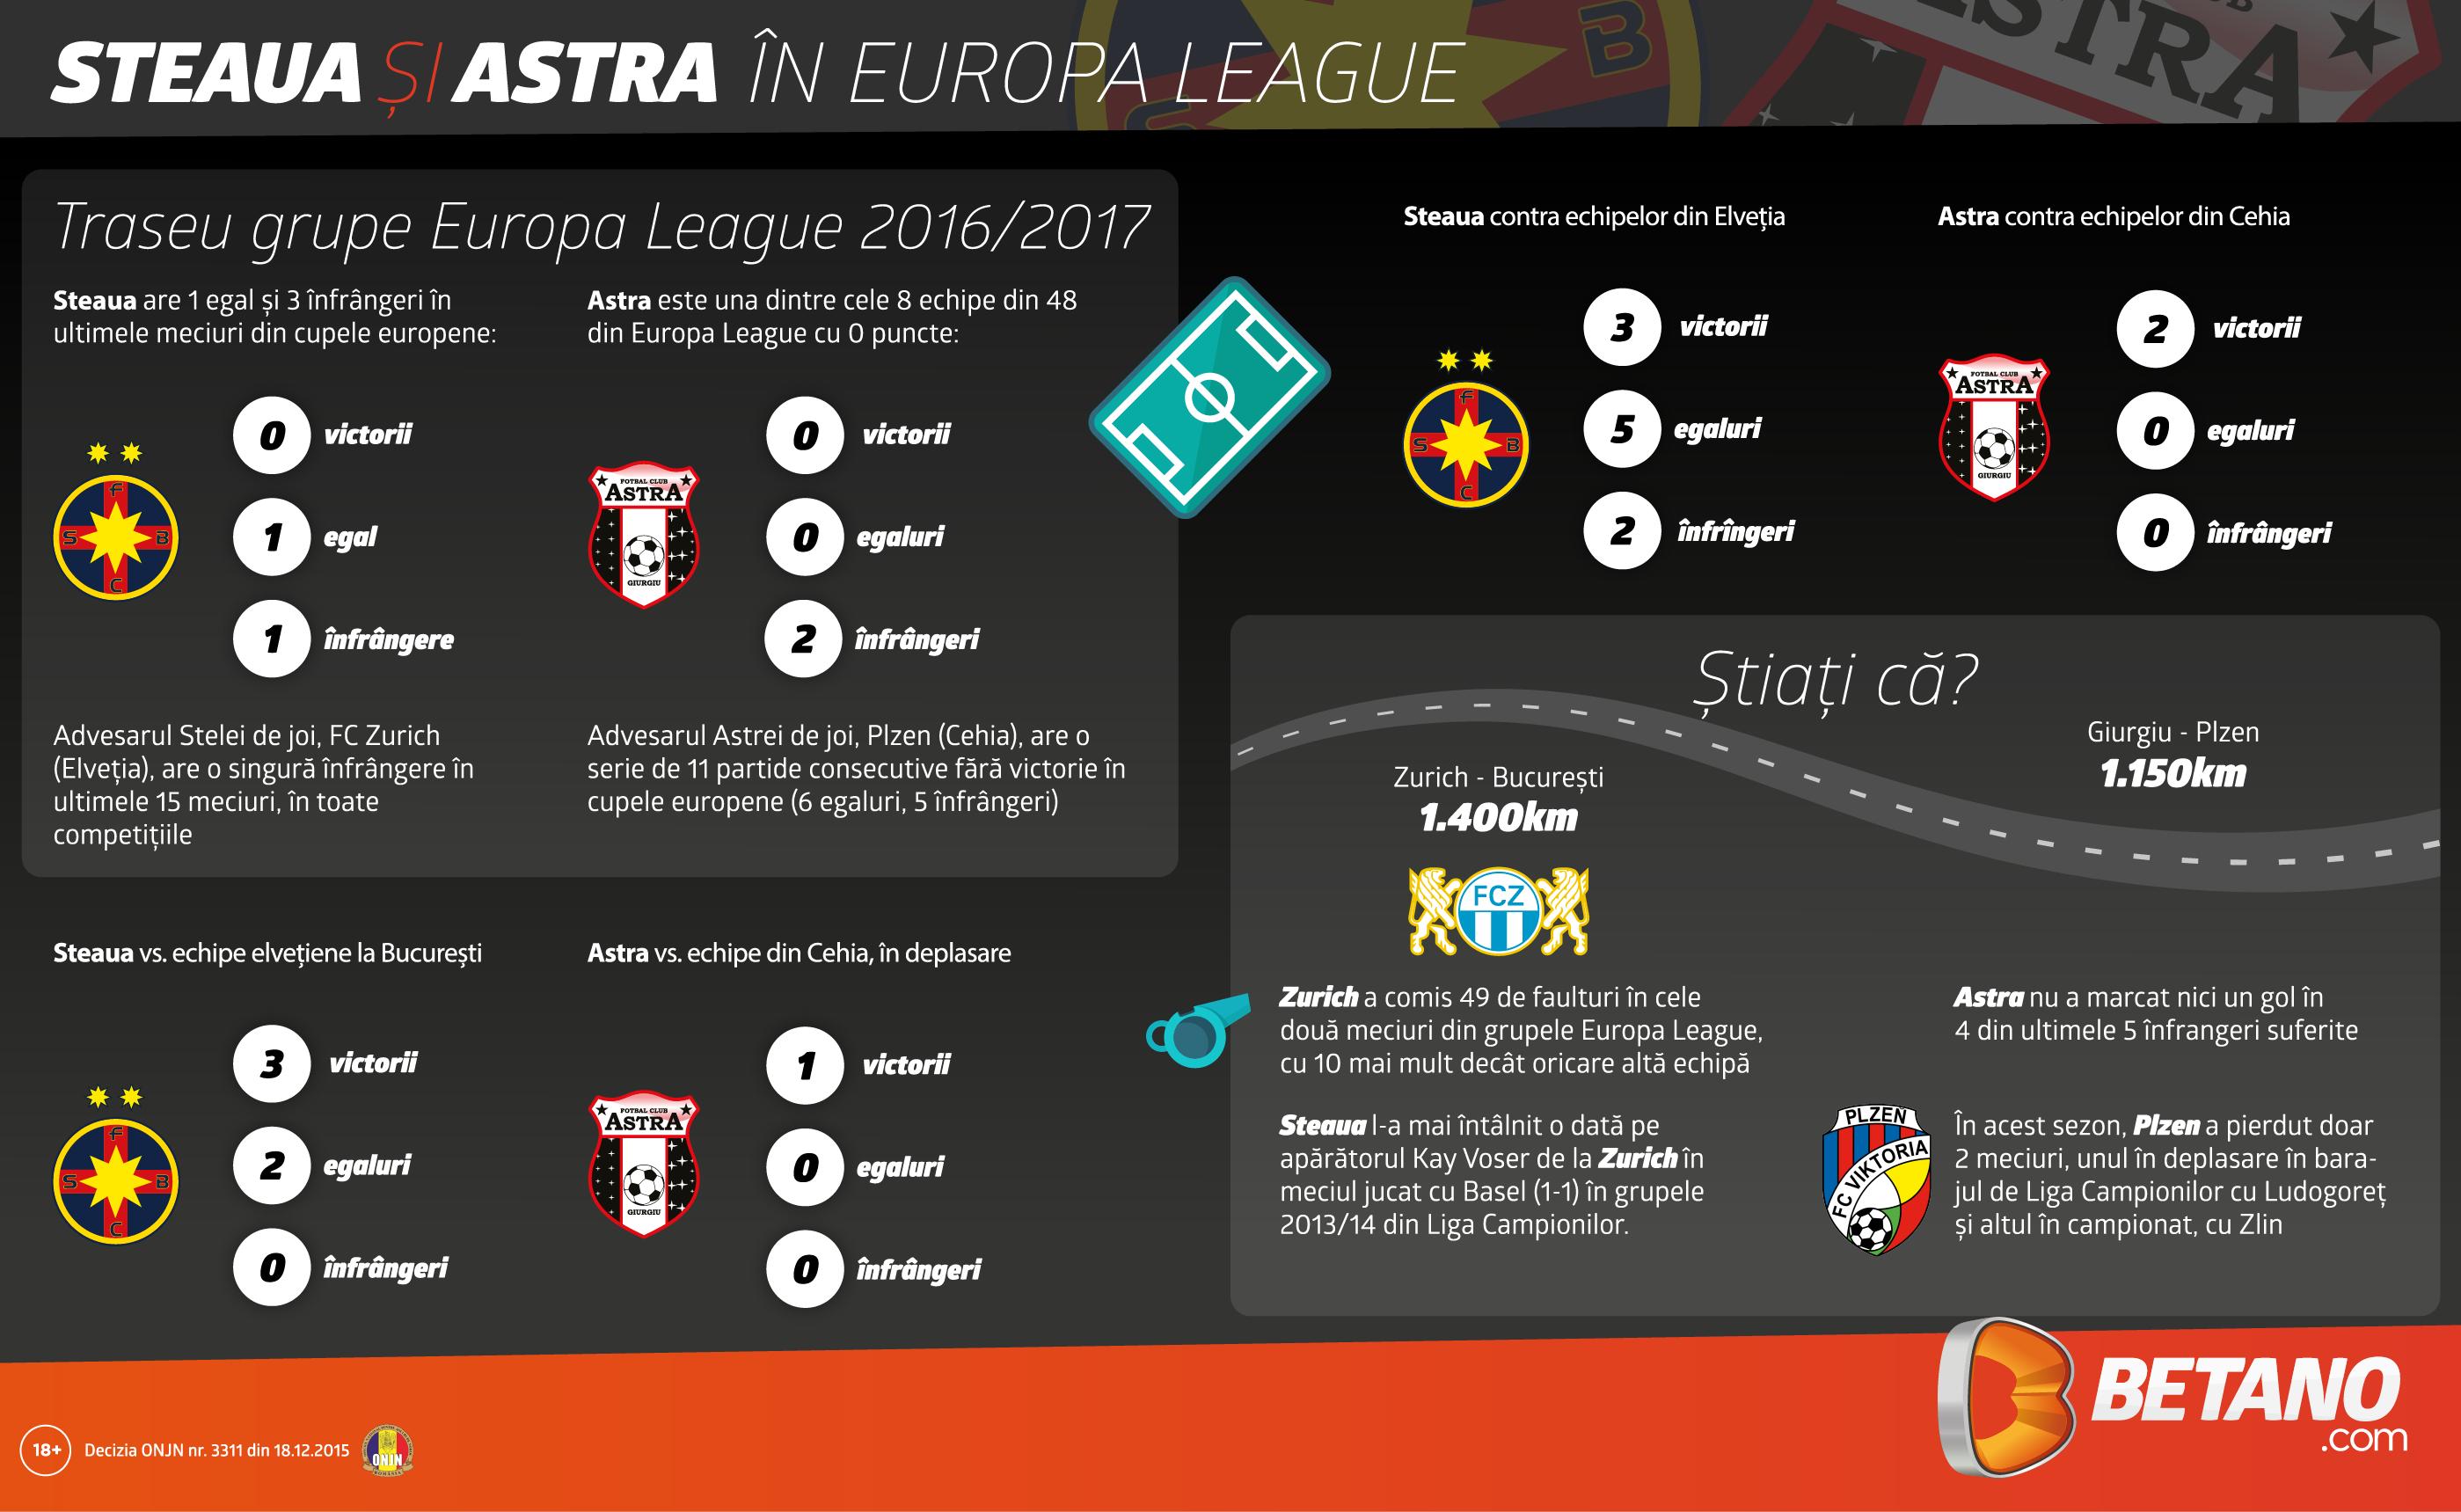 Grafic: Steaua si Astra in Europa League